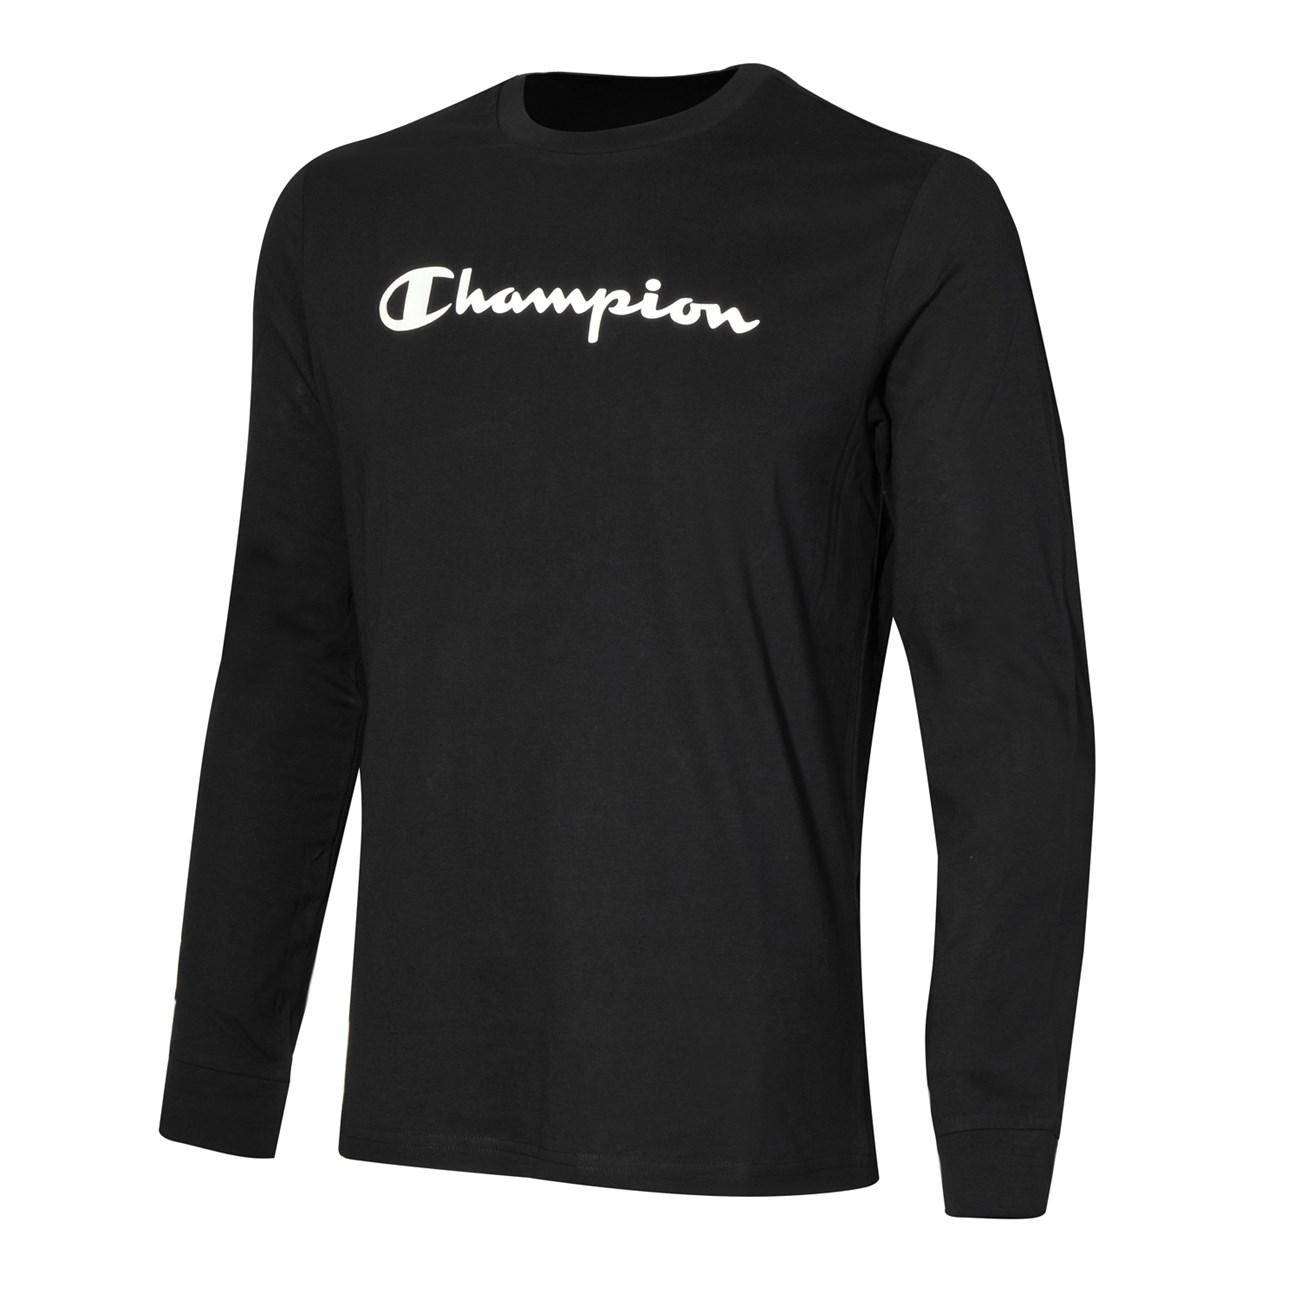 CHAMPION Long Sleeve Big Logo   Ανδρικά Μακρυμάνικα T-shirts ... 6a3917ad169